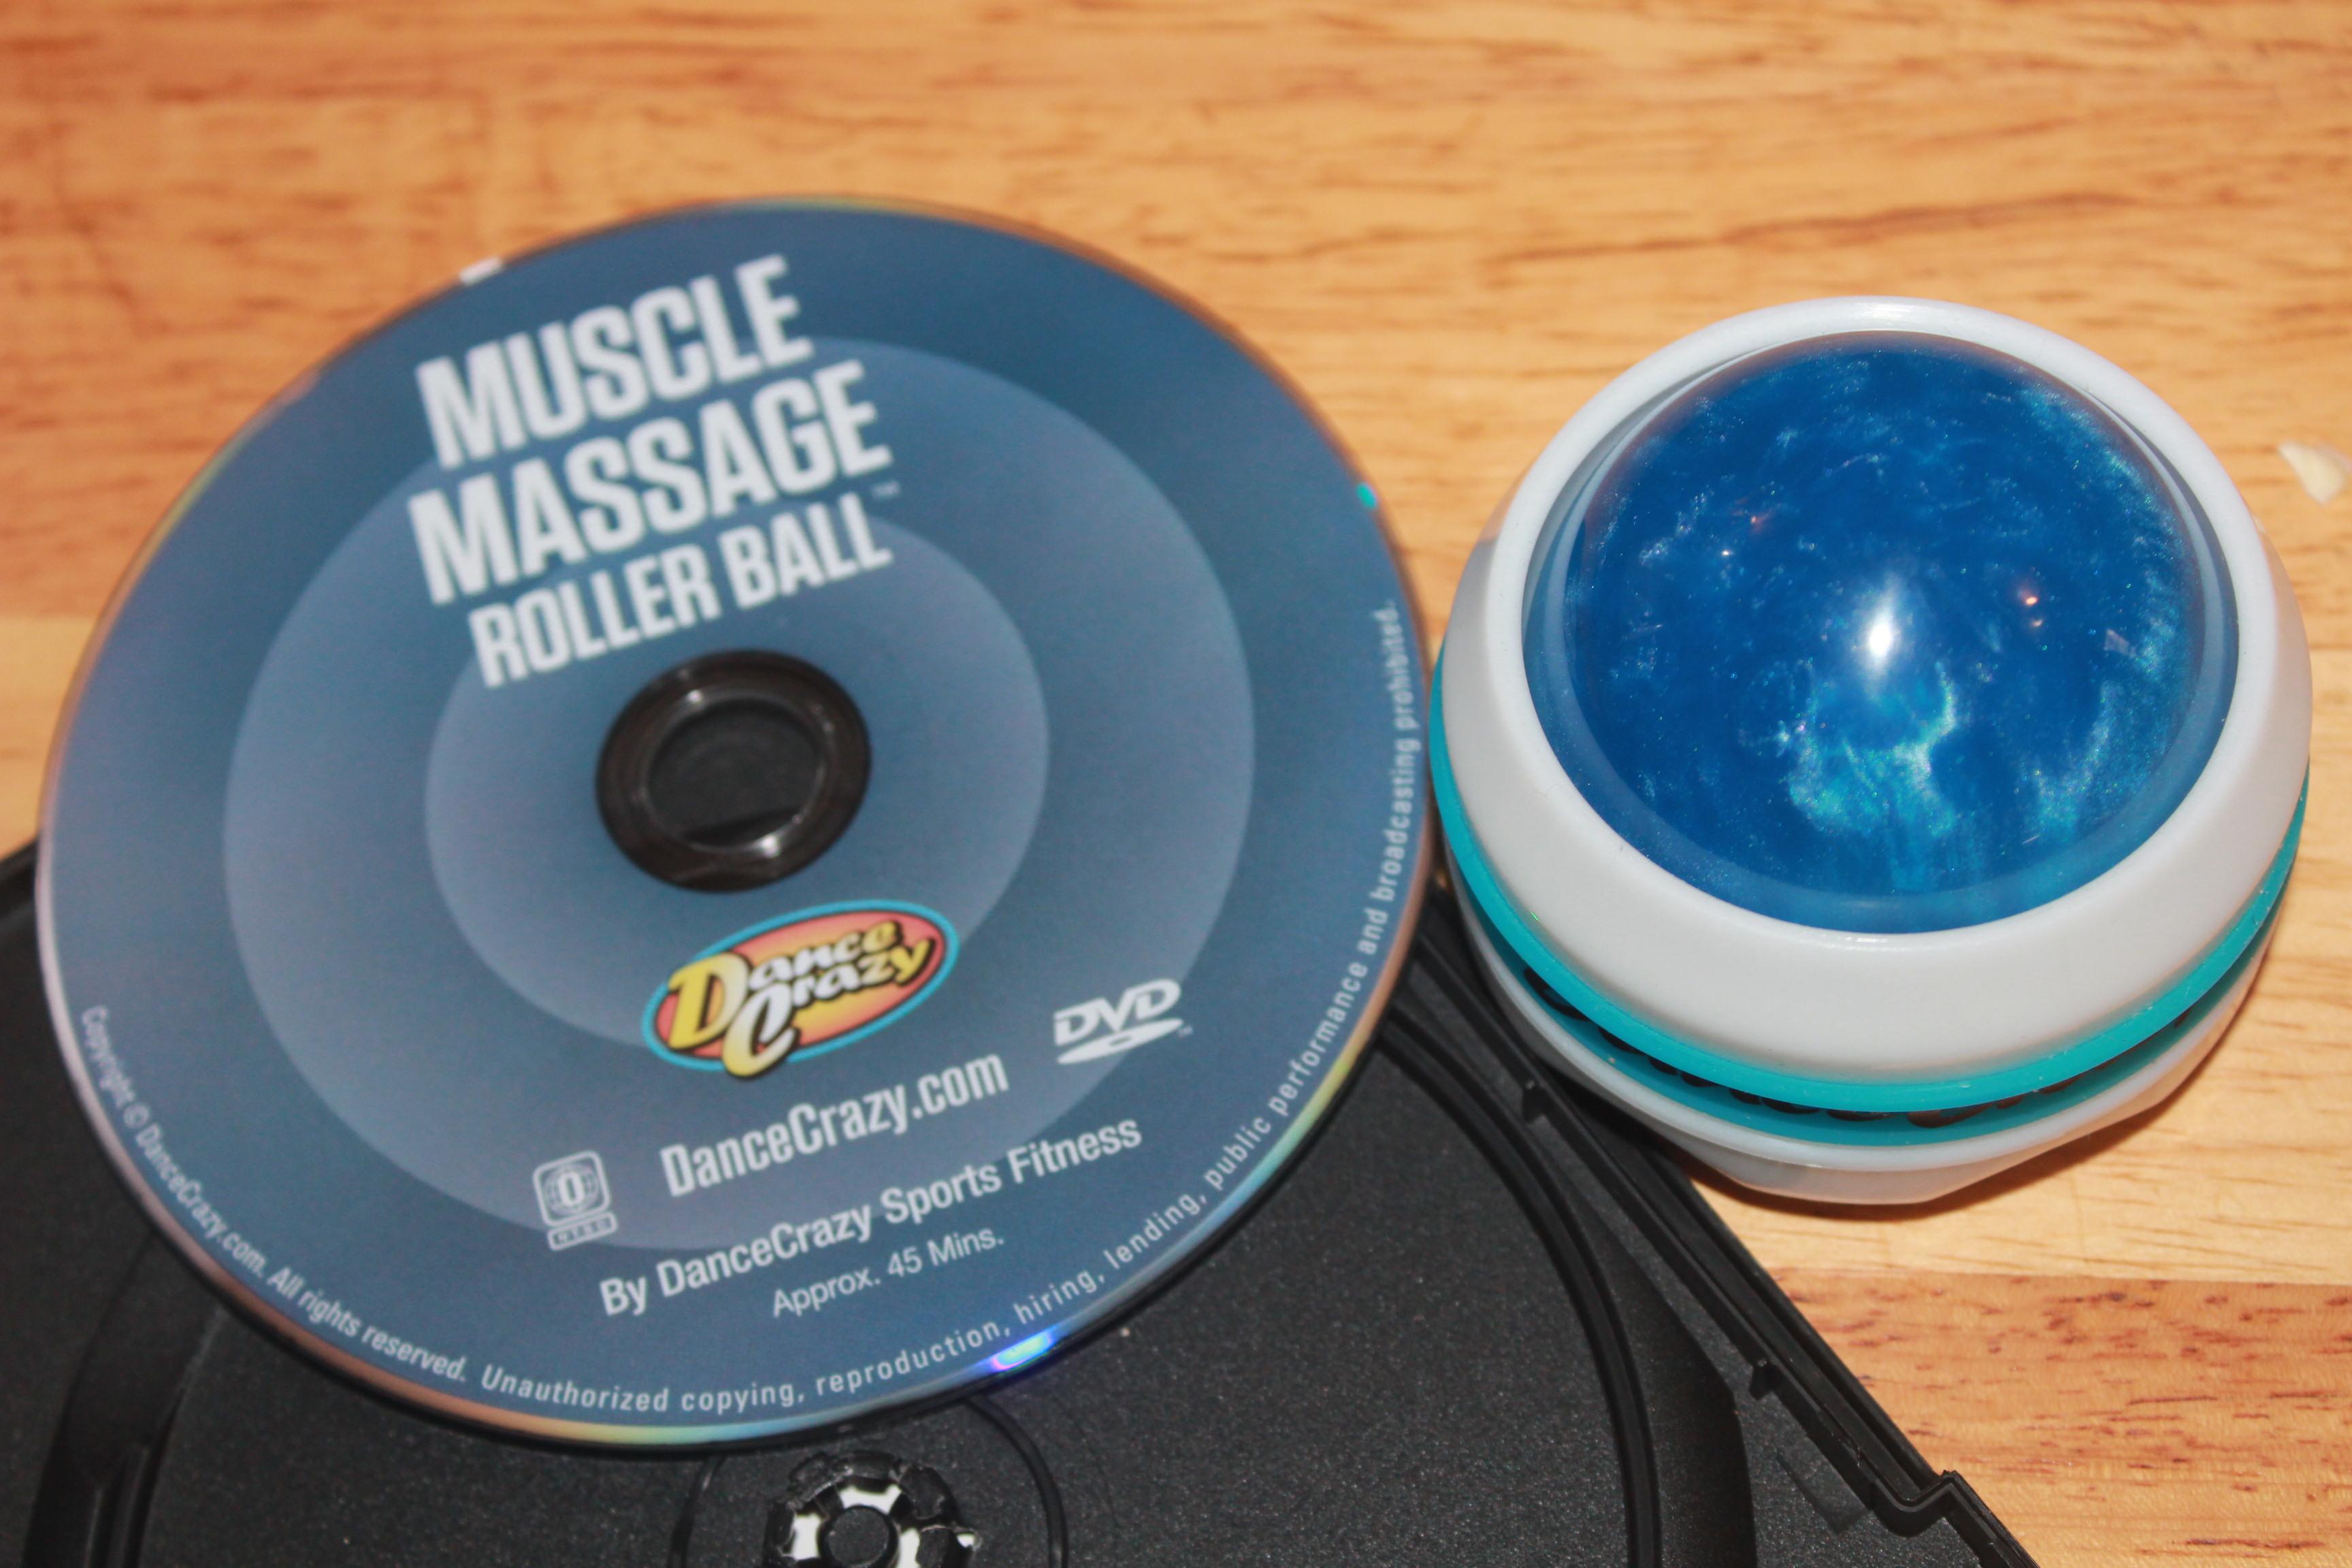 review dancecrazy massager roller ball dvd nfr6k reviews. Black Bedroom Furniture Sets. Home Design Ideas